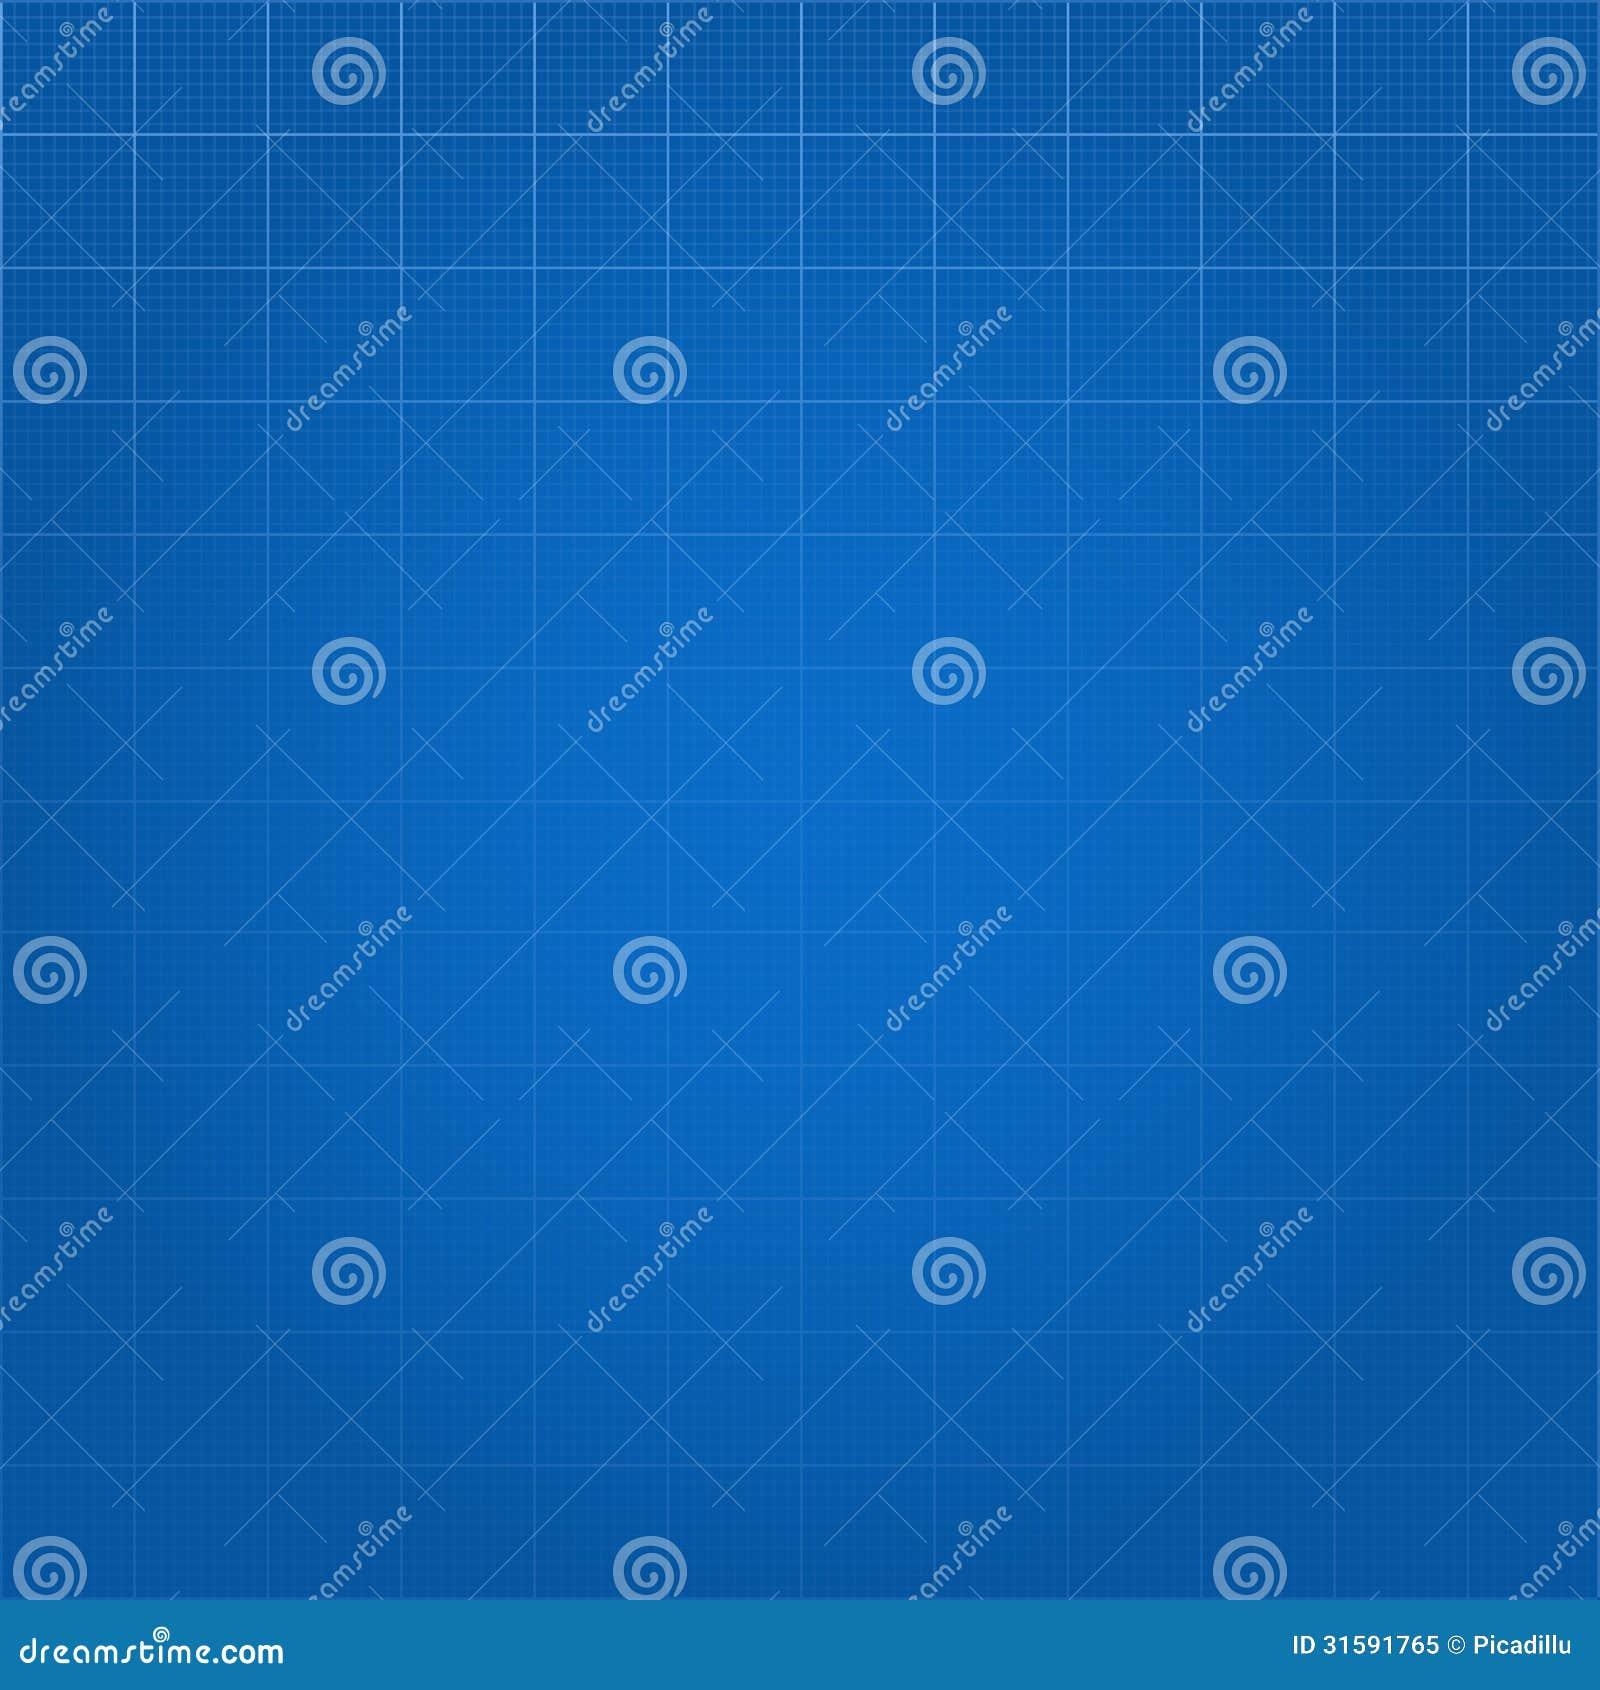 Blueprint paper background stock vector illustration of royalty free stock photo malvernweather Choice Image